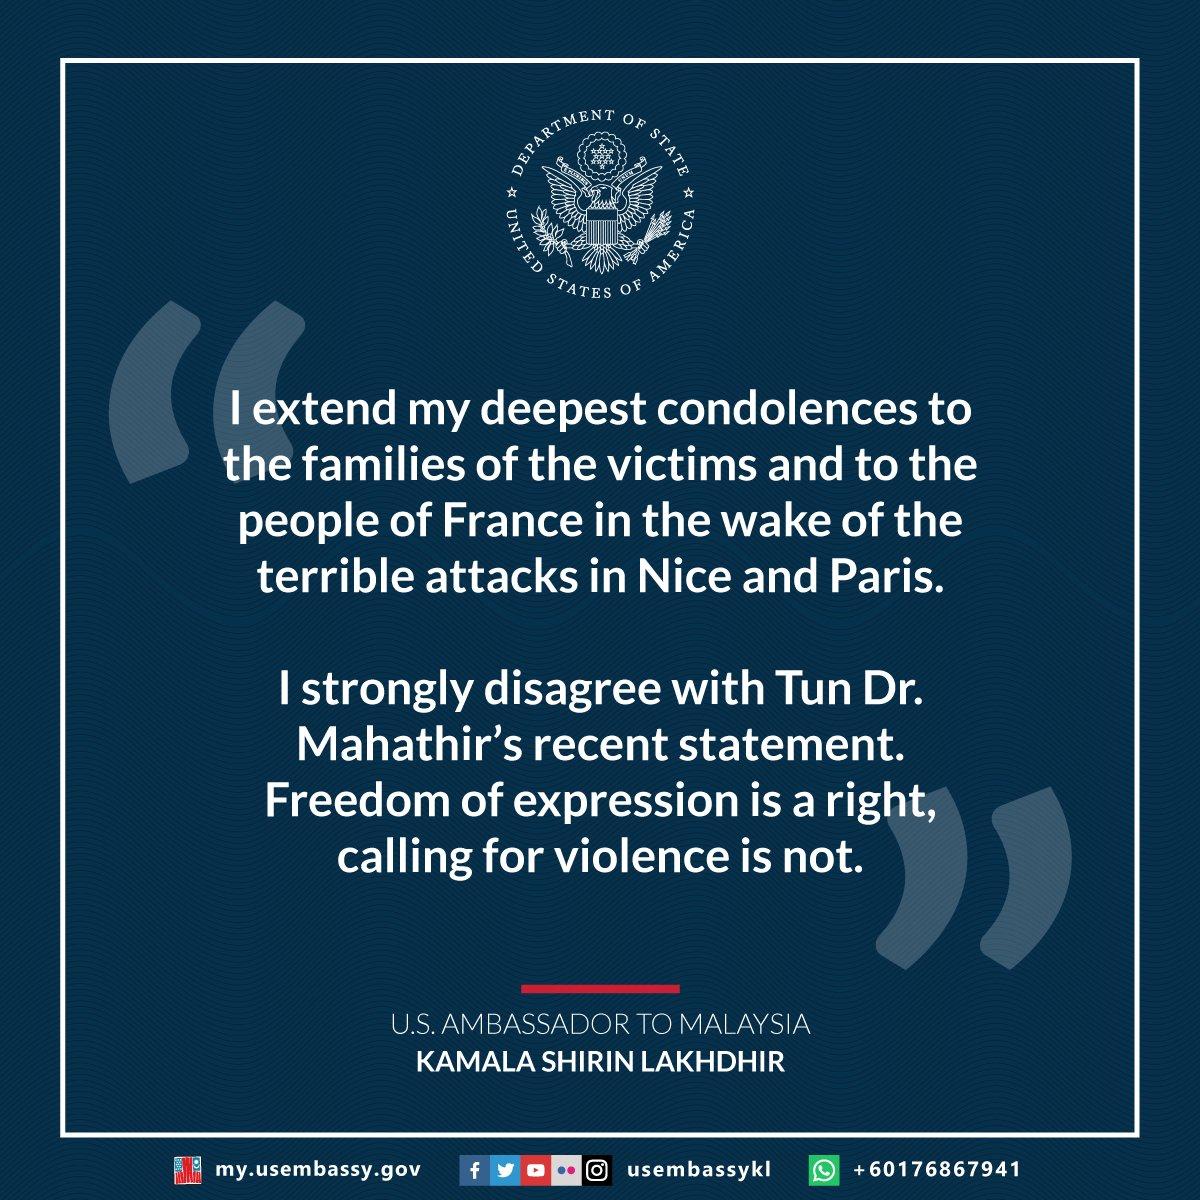 Statement by Ambassador Lakhdhir: